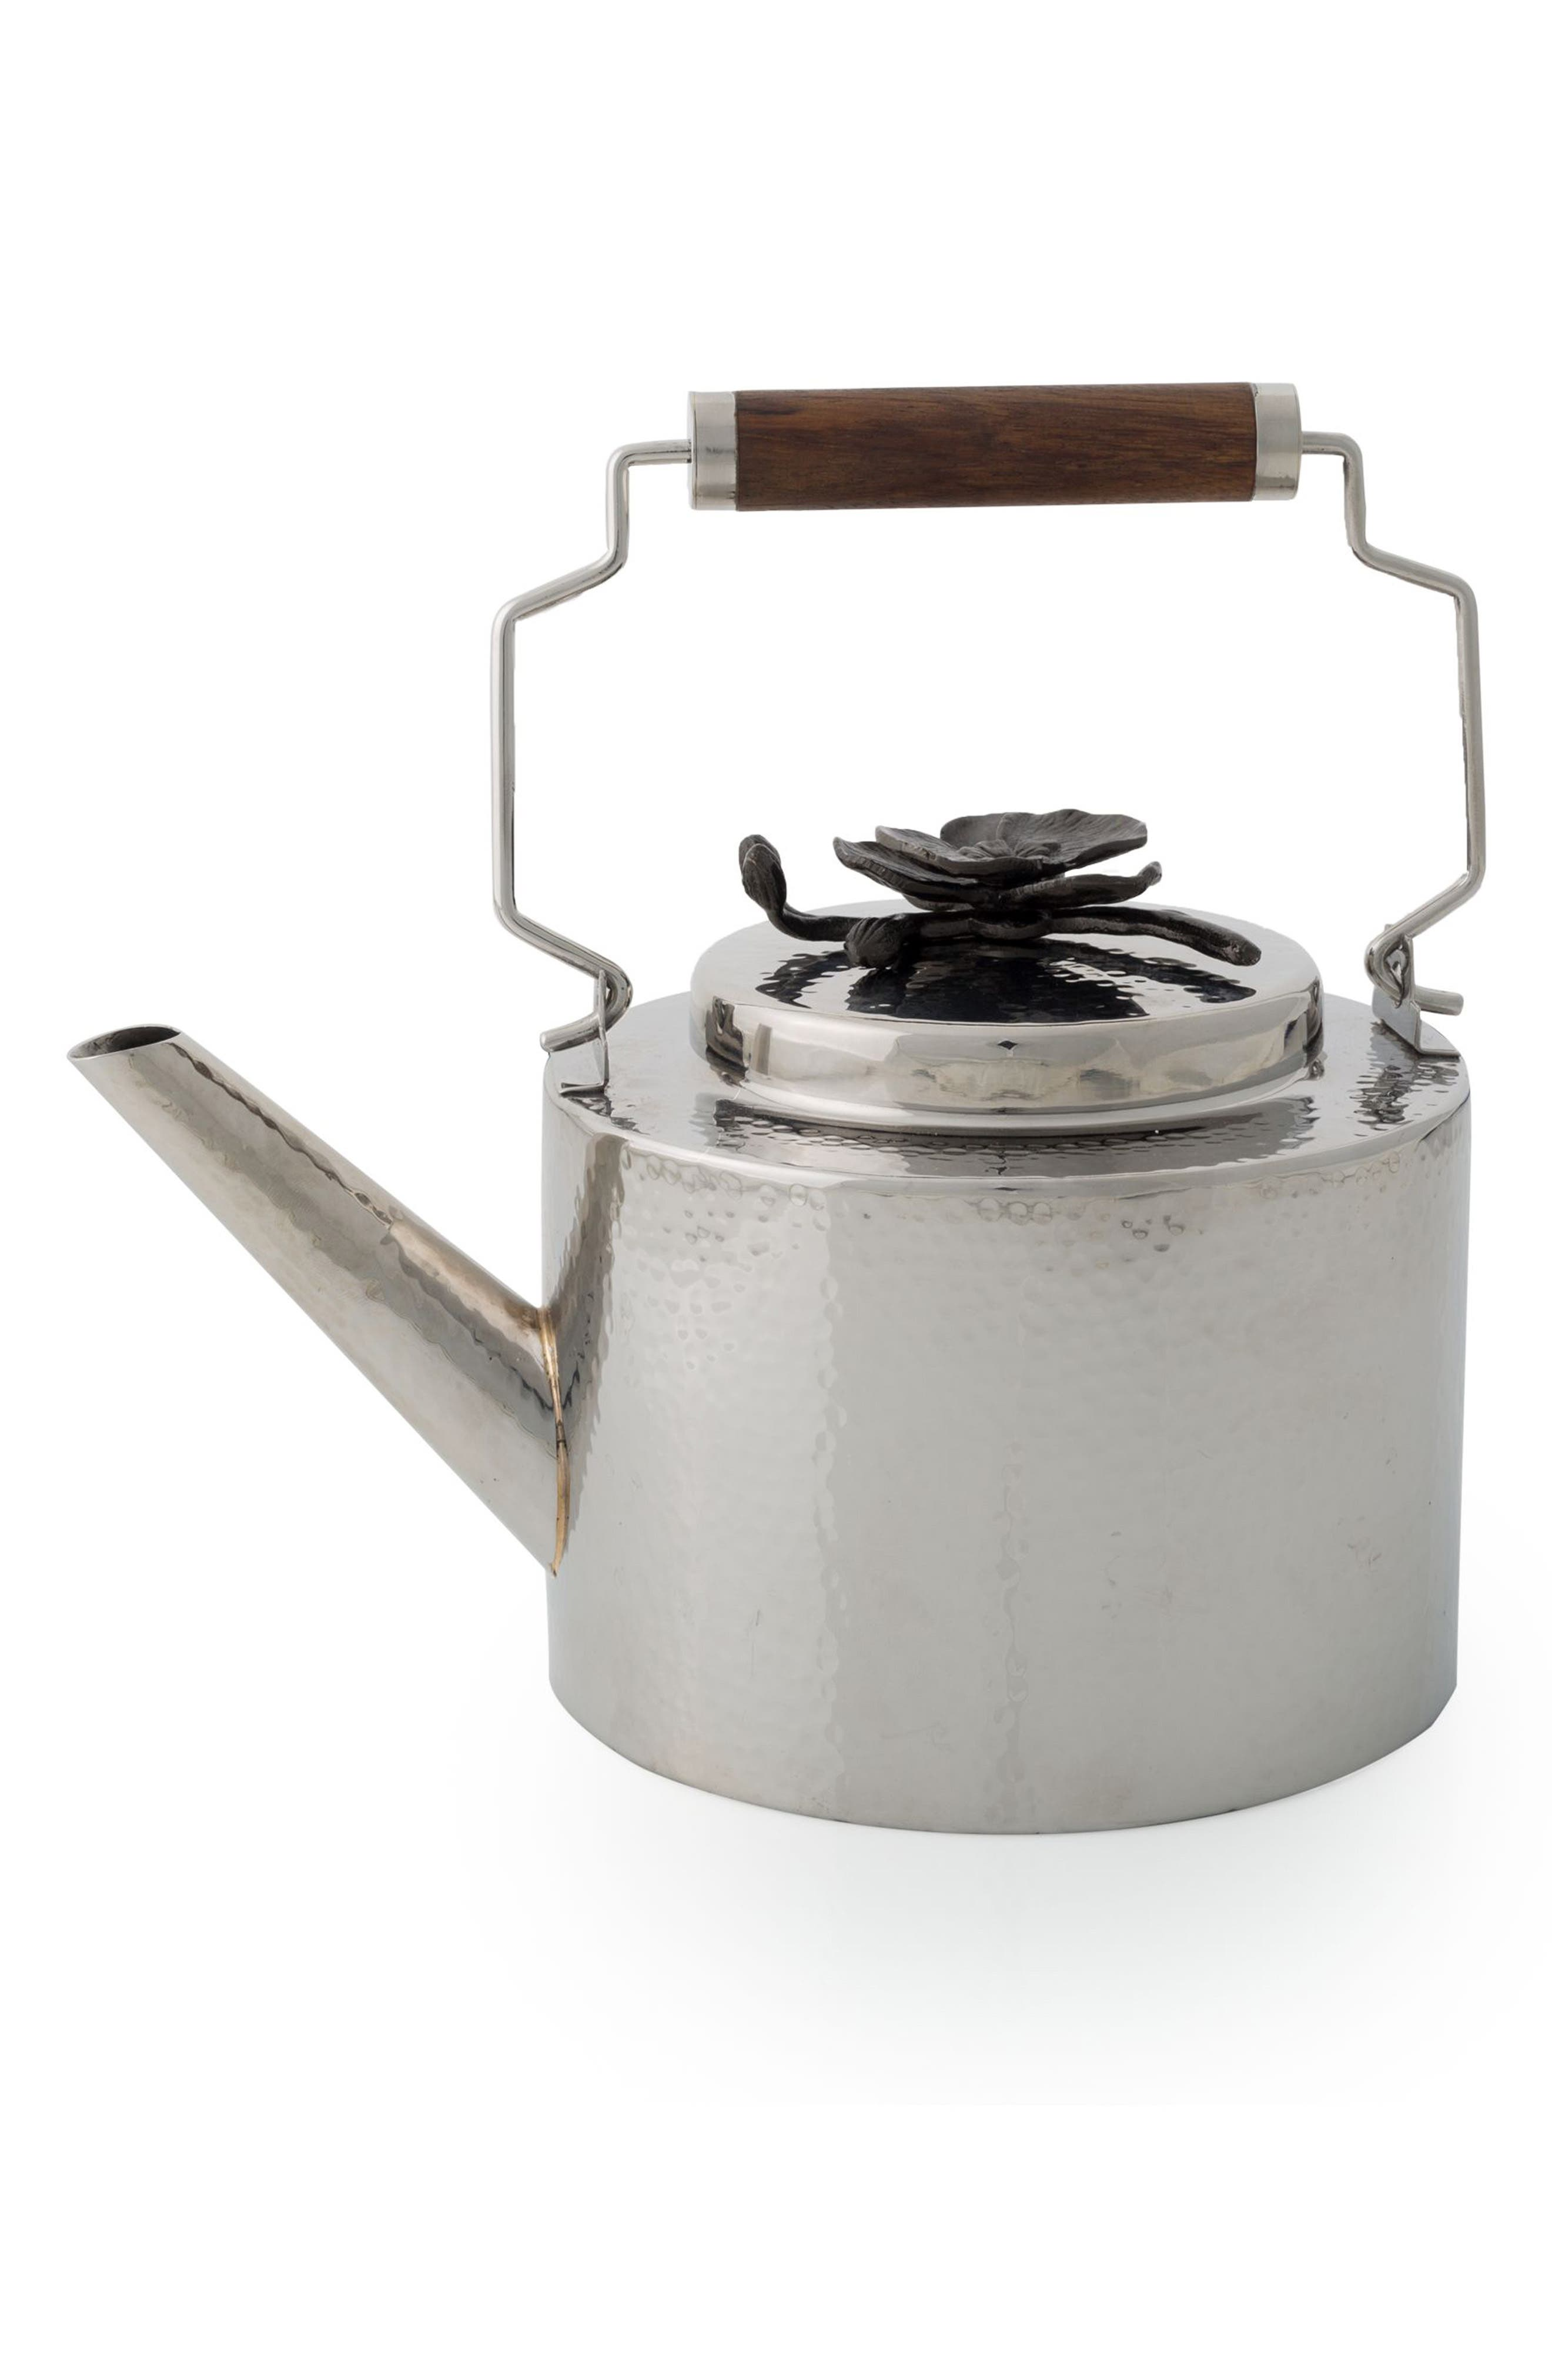 Main Image - Michael Aram Stainless Steel Teapot